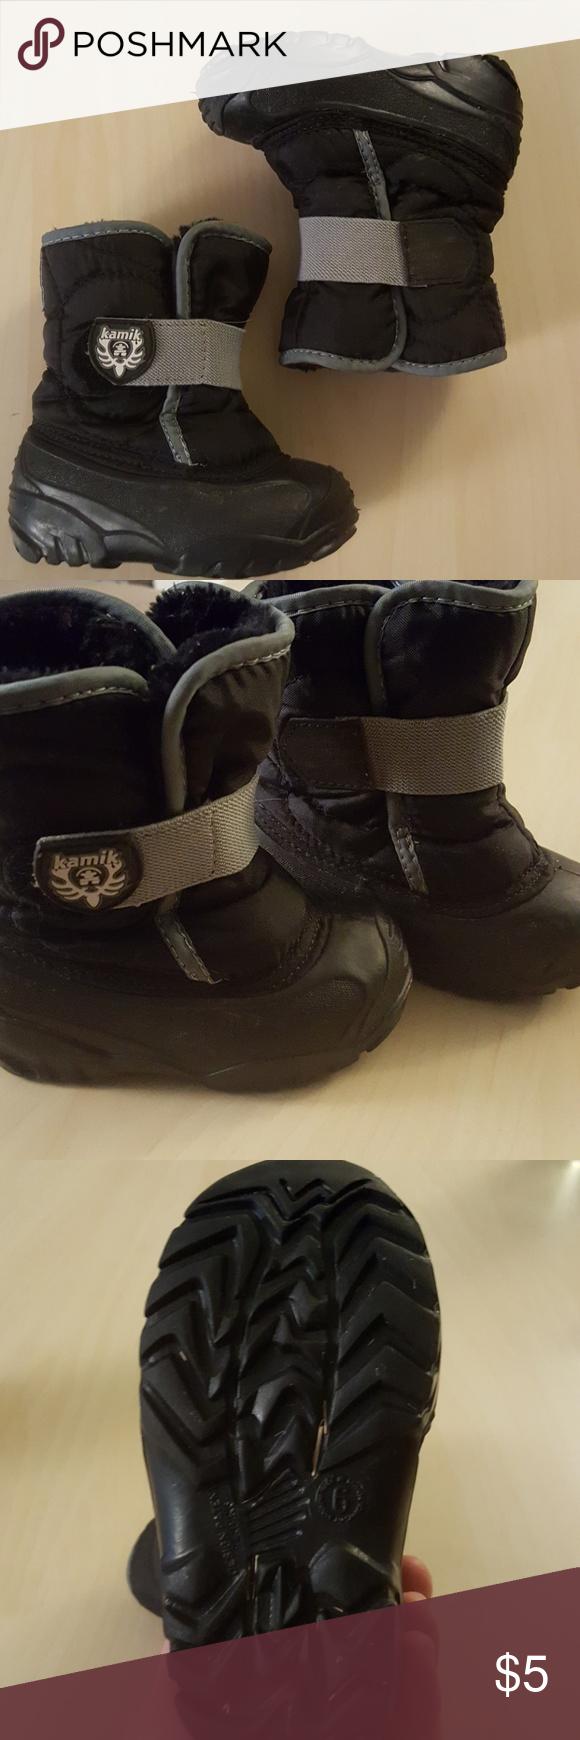 Kamik Toddler Snow Boots Size 6 Black